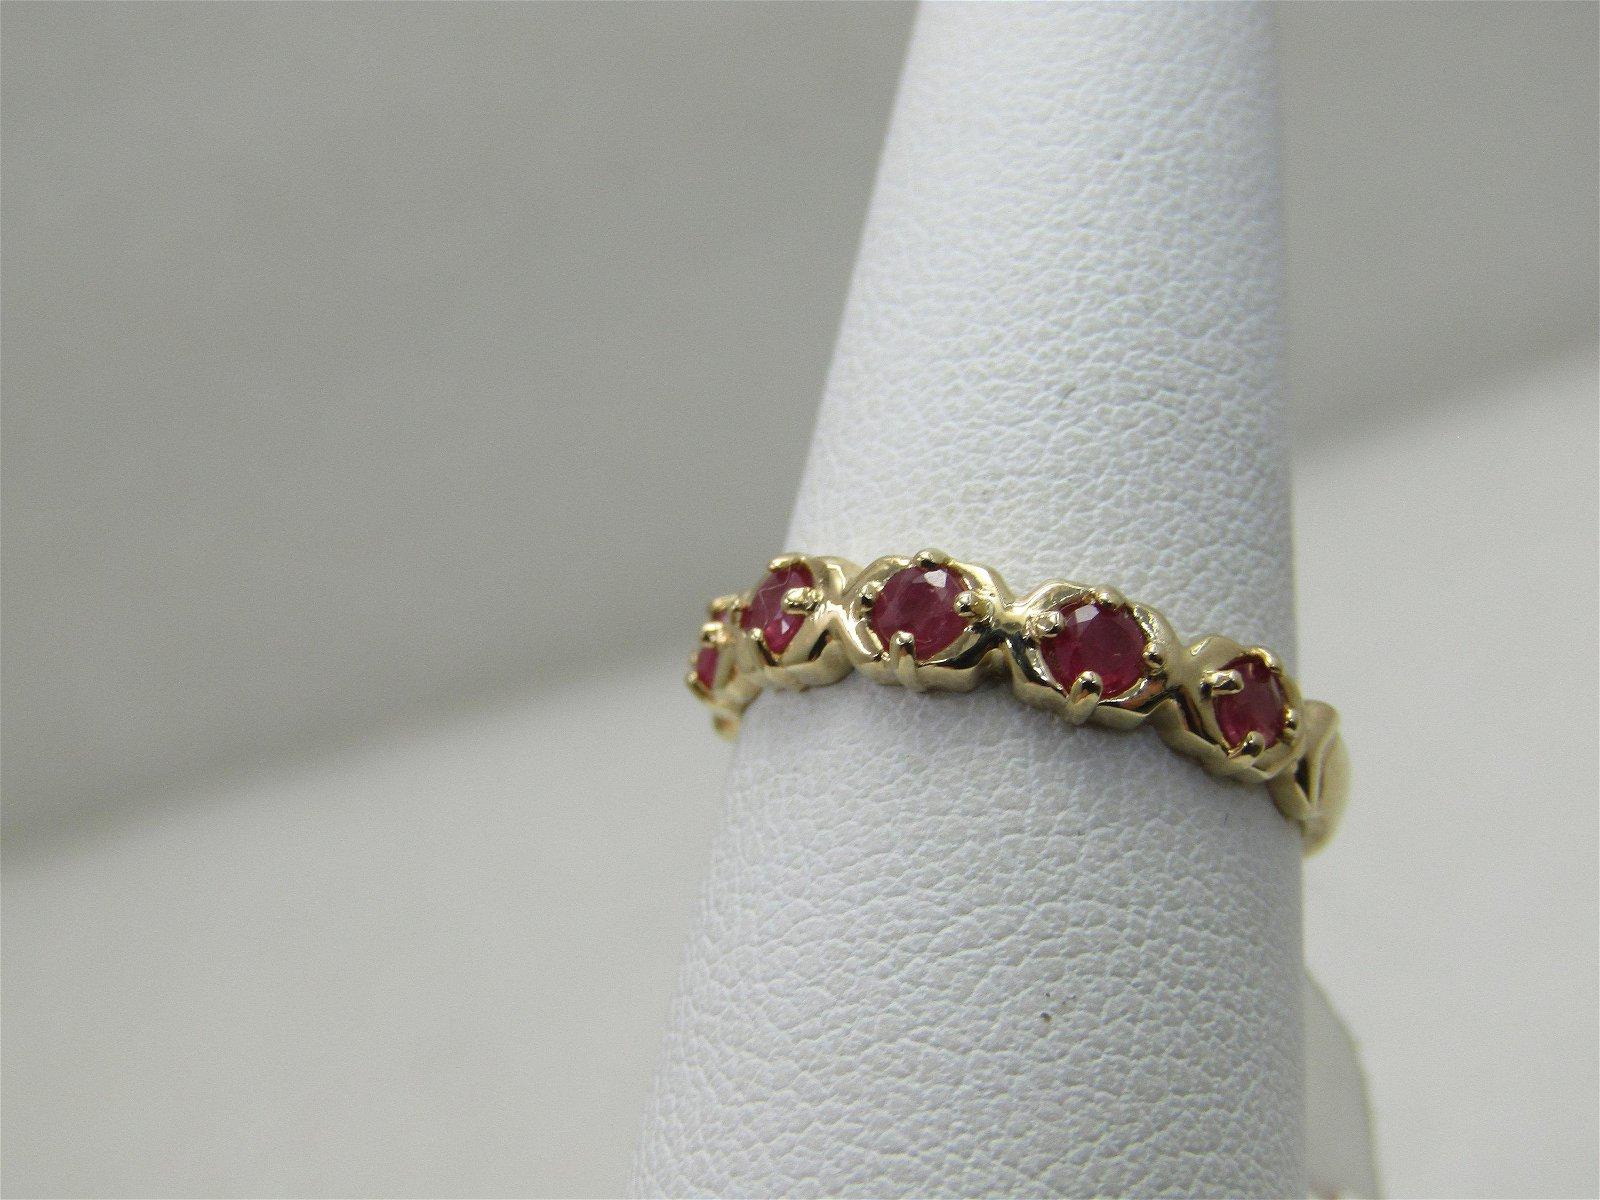 Vintage 10kt Ruby Band/Ring, XO Design, Size 7